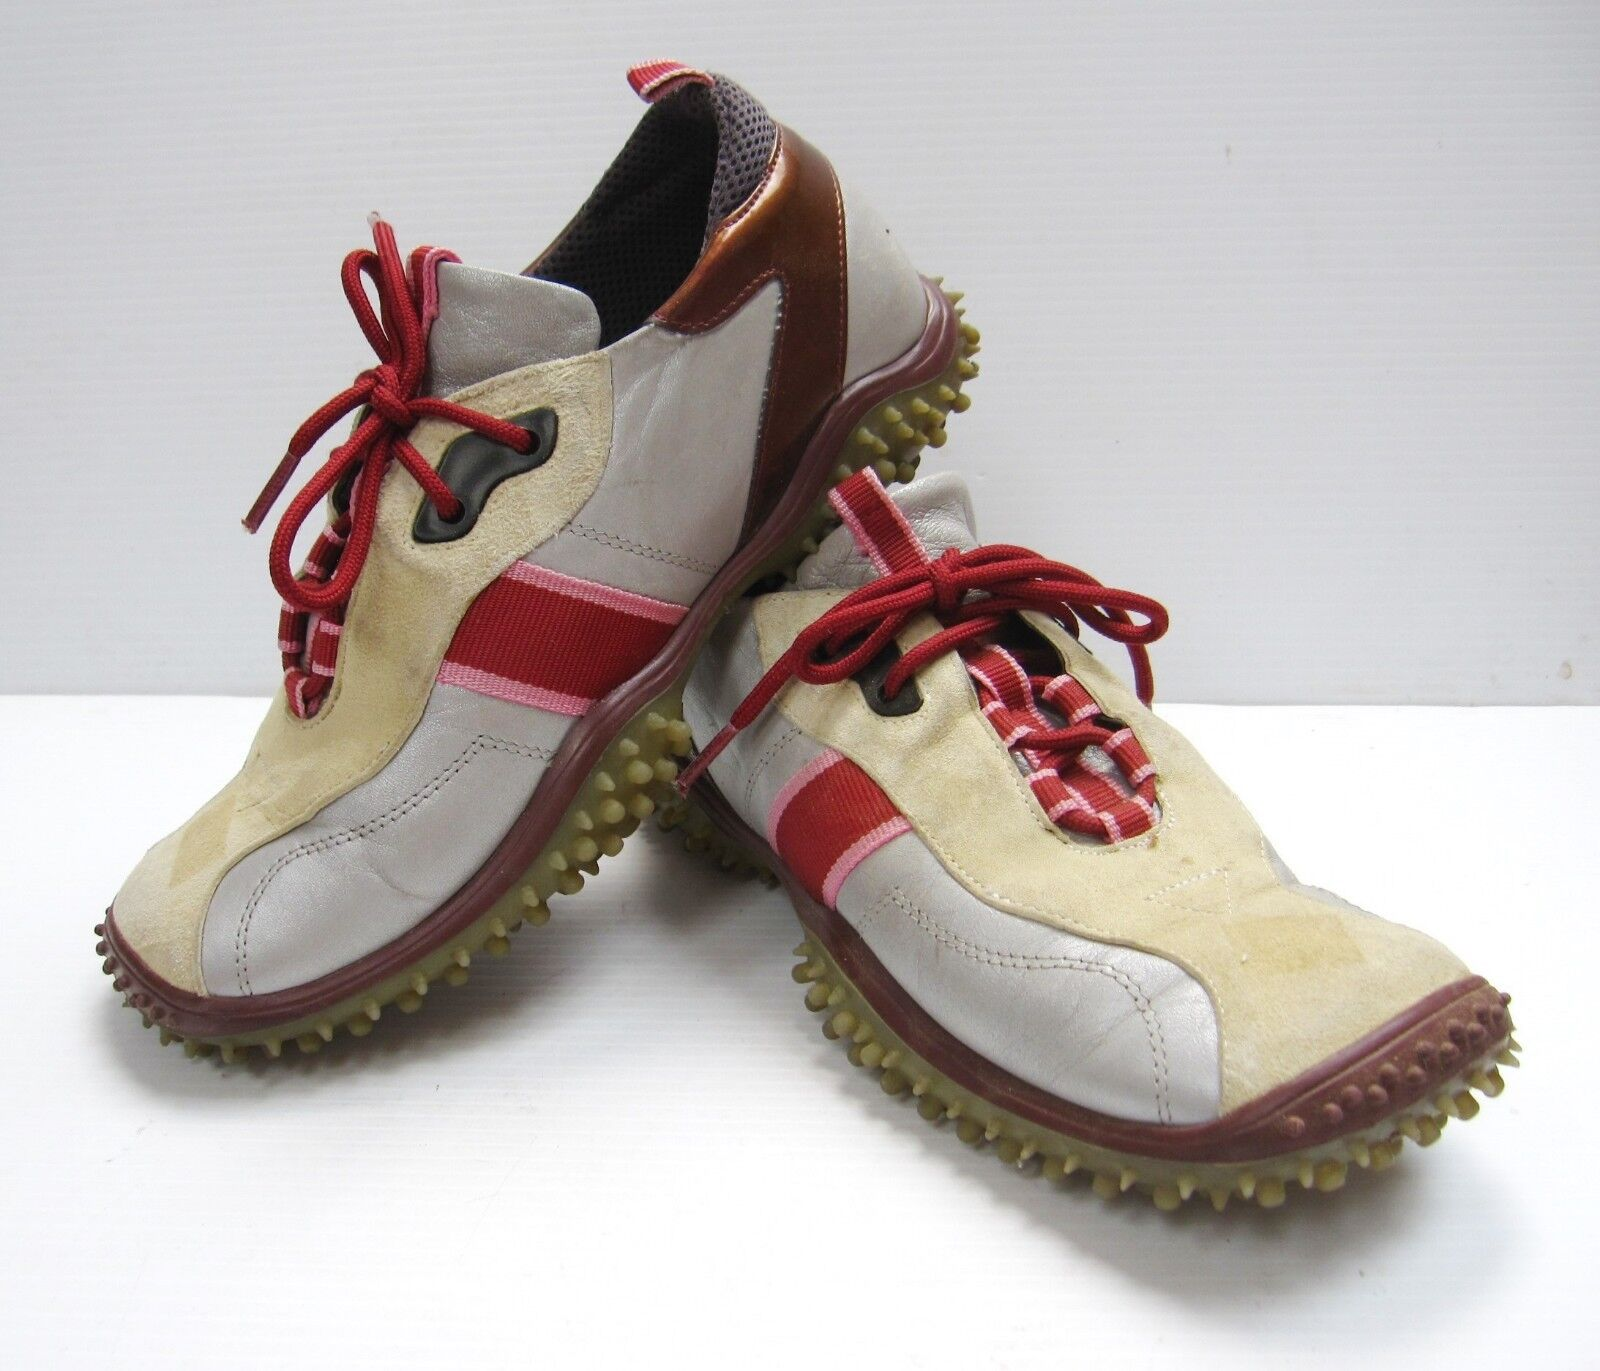 Damenschuhe RARE Nordstrom Dimol Schuhes  Leder Tennis Athletic SNEAKERS Schuhes Dimol 38 2f761f